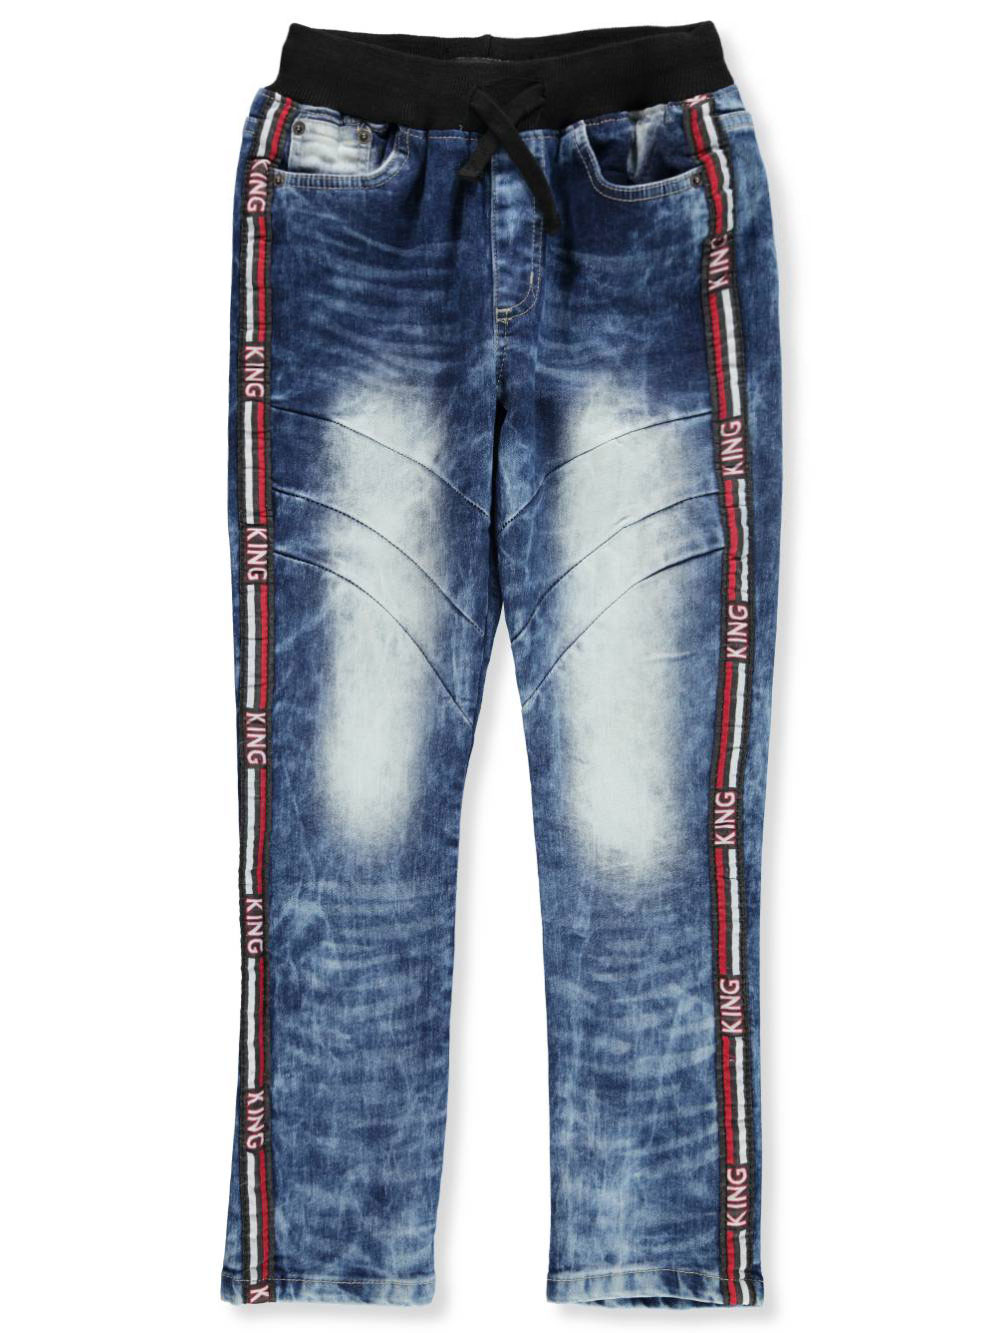 8c7f13ed95 GS-115 Boys' Jeans